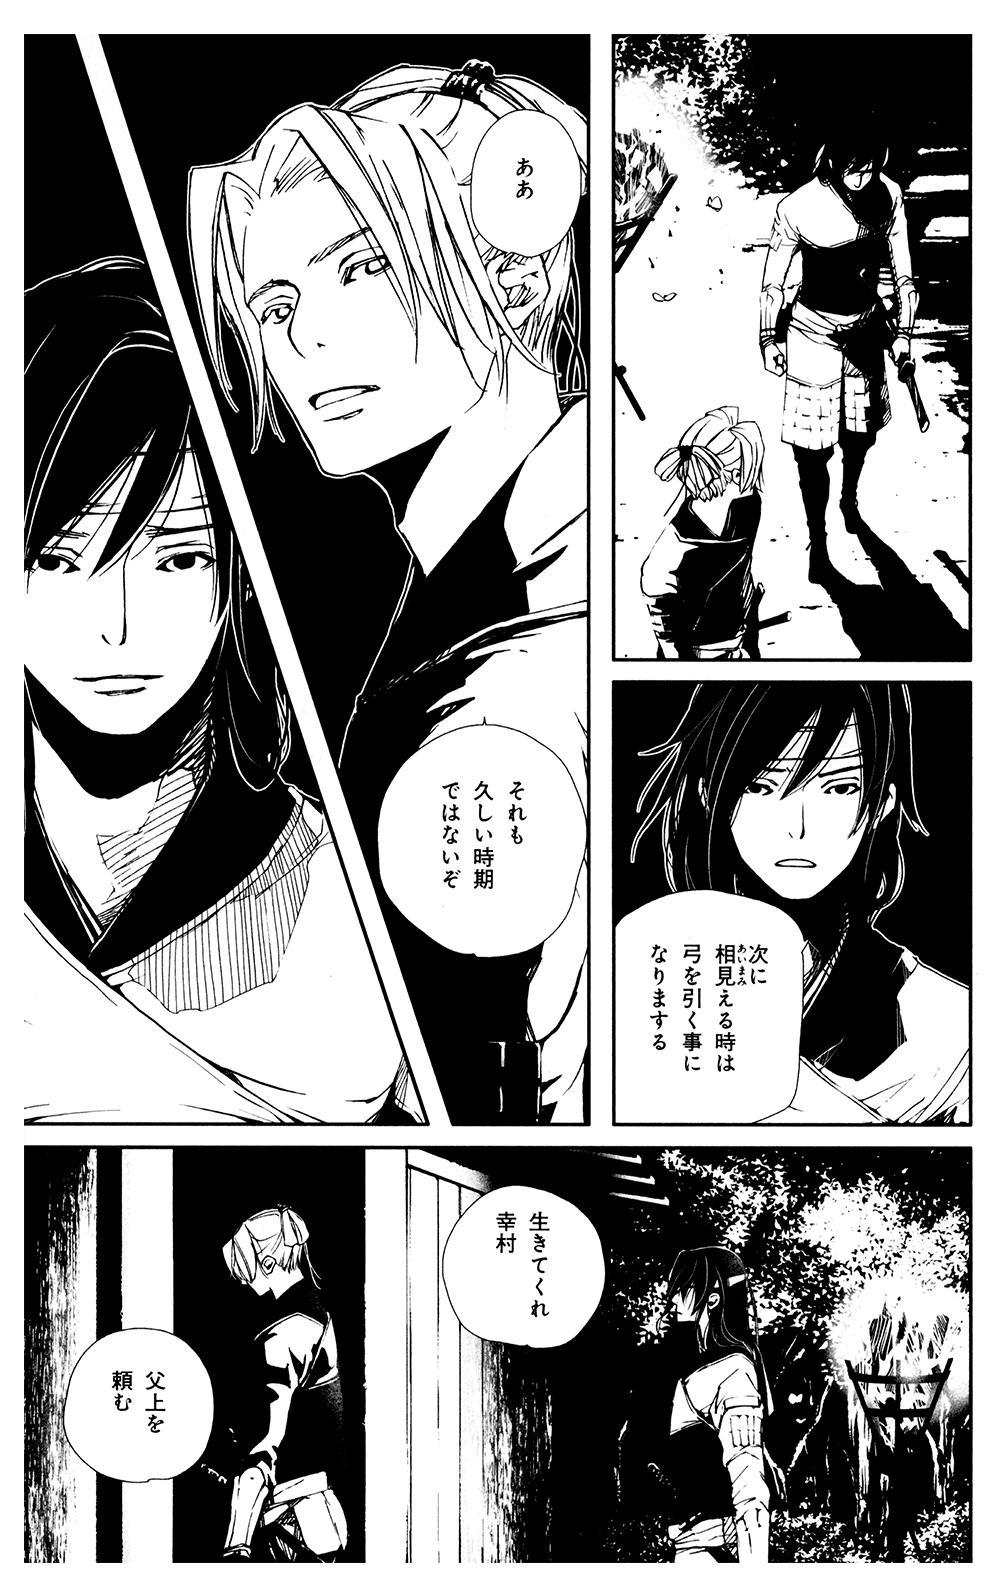 朱黒の仁 第1話①syukoku-1-07.jpg